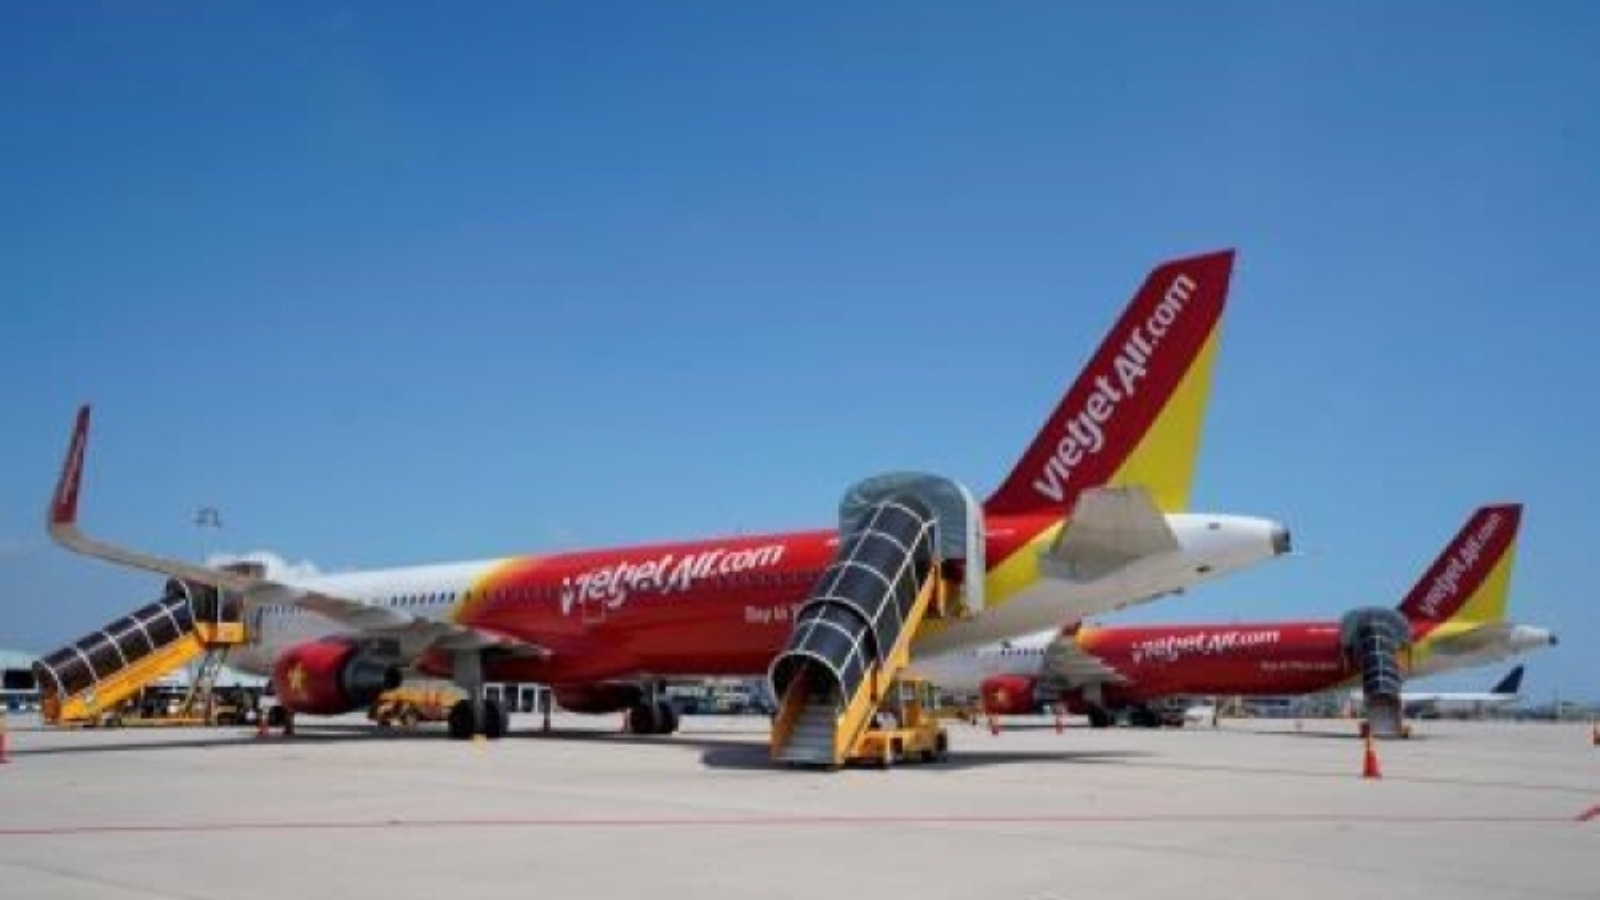 Vietjet Air reschedules flights to Busan due to Typhoon Danas